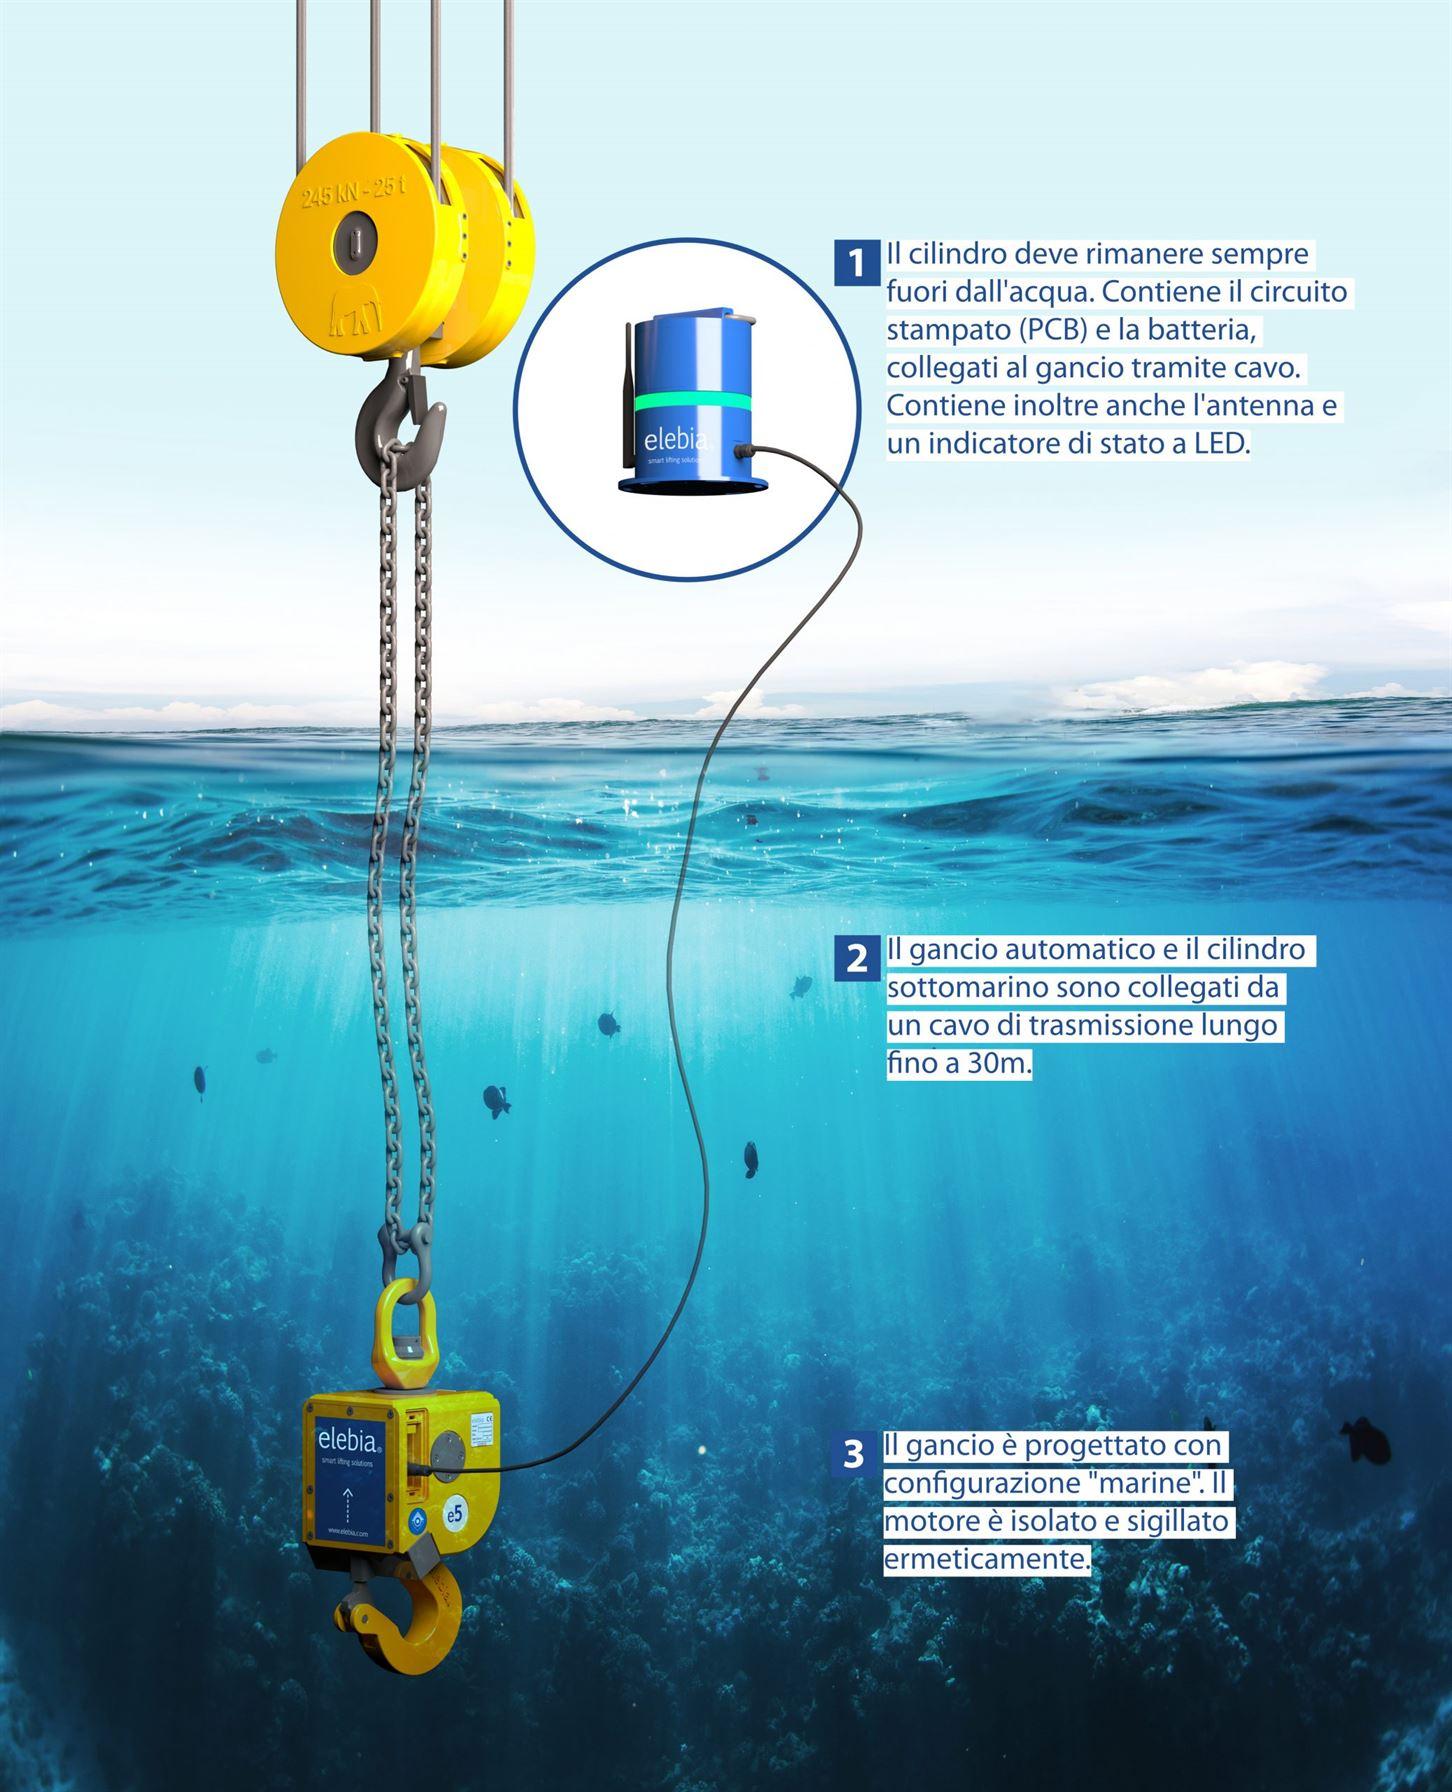 Gancio Sottomarino scaled - Gancio Sottomarino